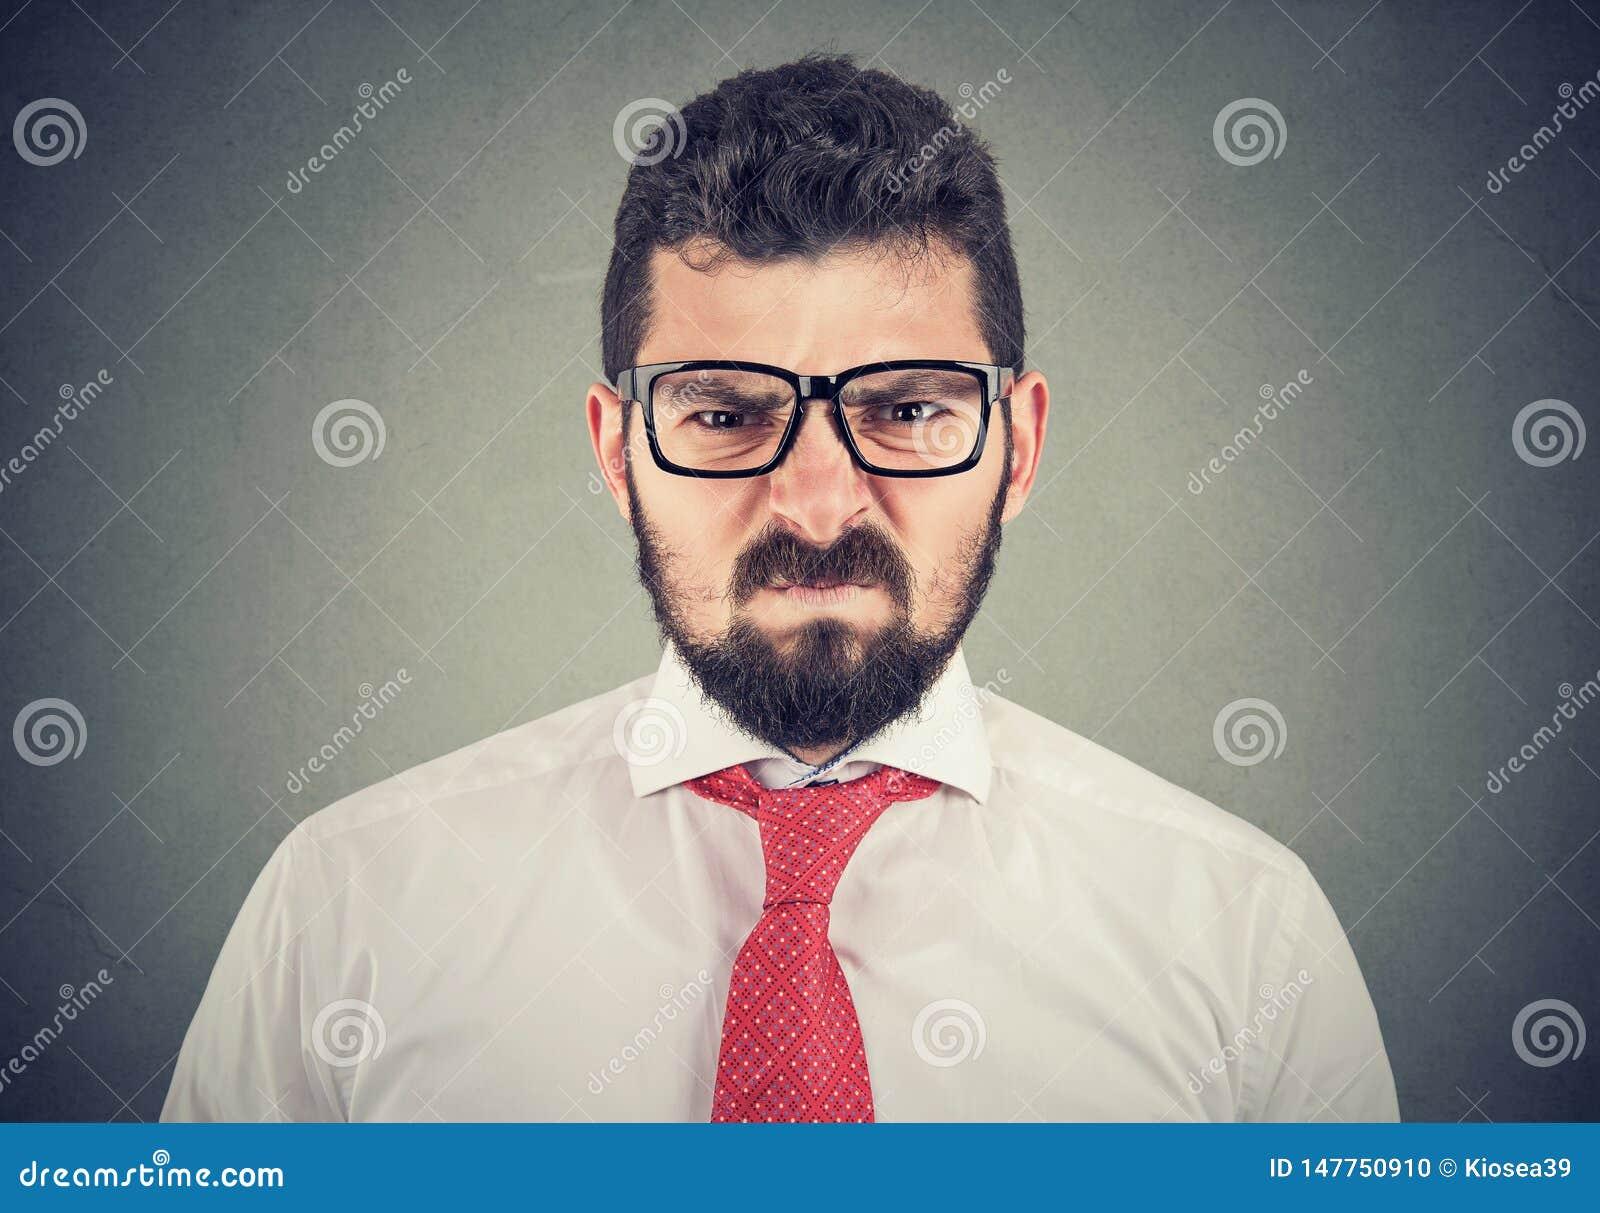 Homme grincheux f?ch? regardant tr?s contrari?